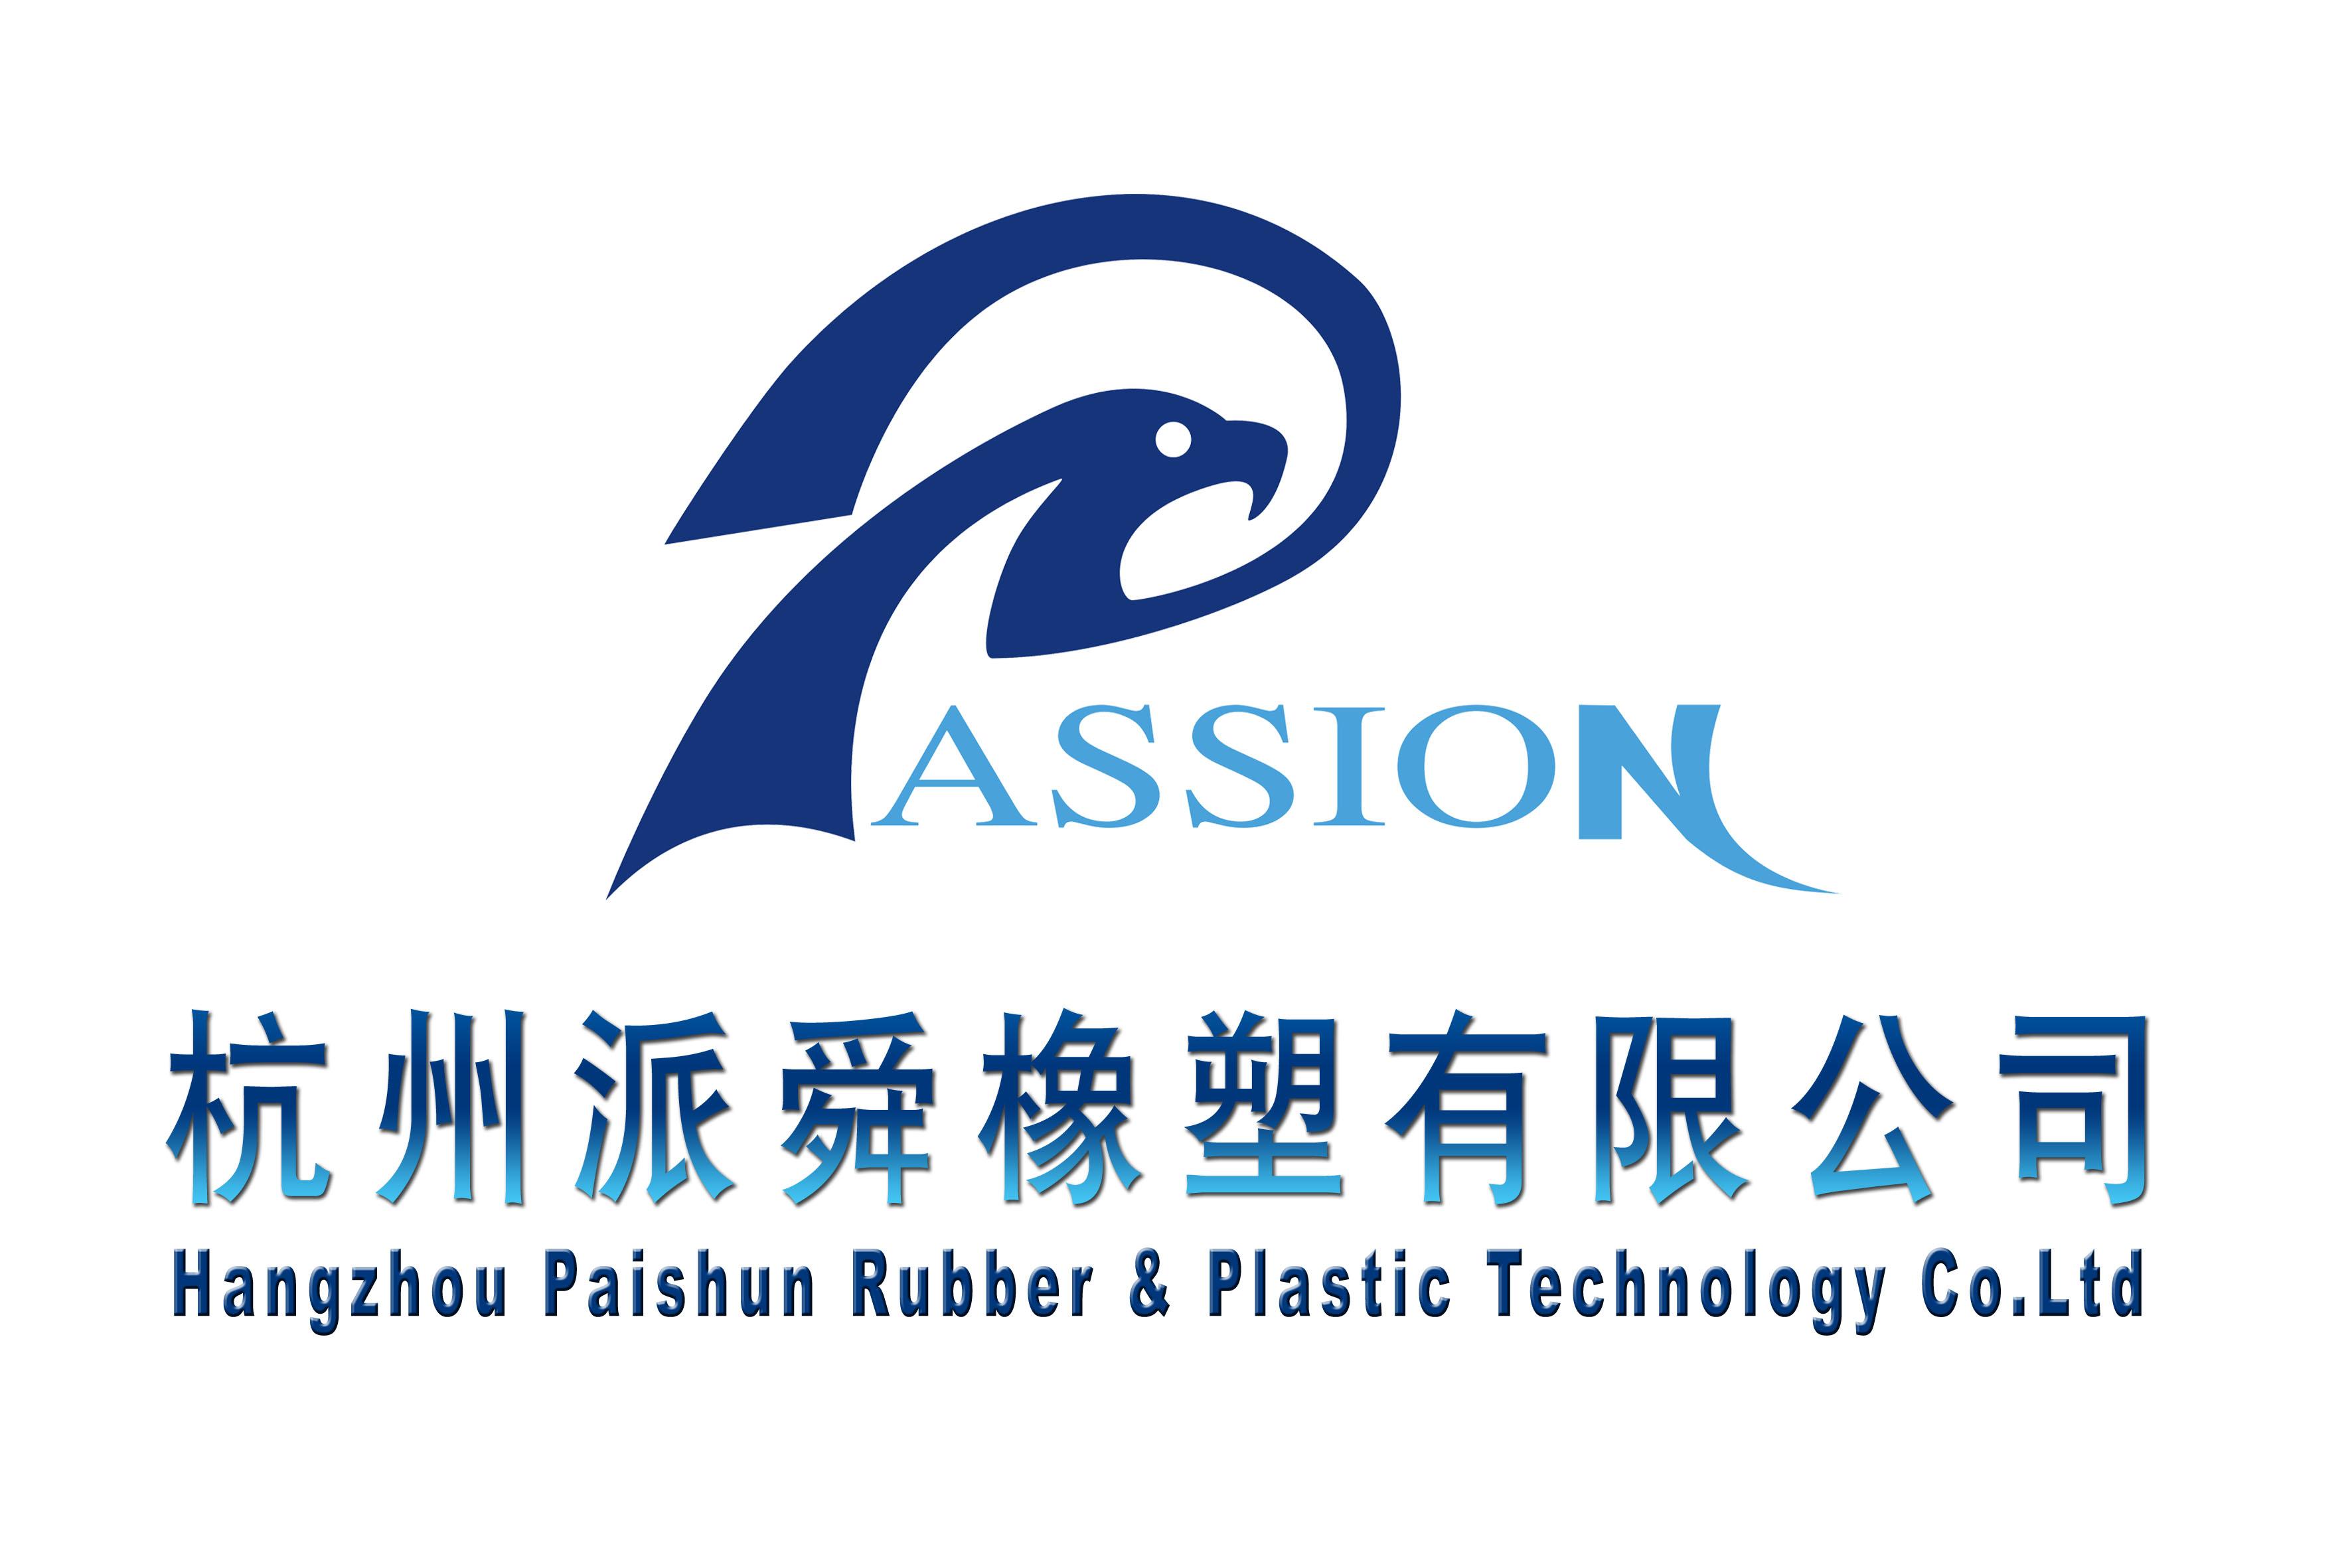 Hangzhou Paishun Rubber and Plastic Co. Ltd. China